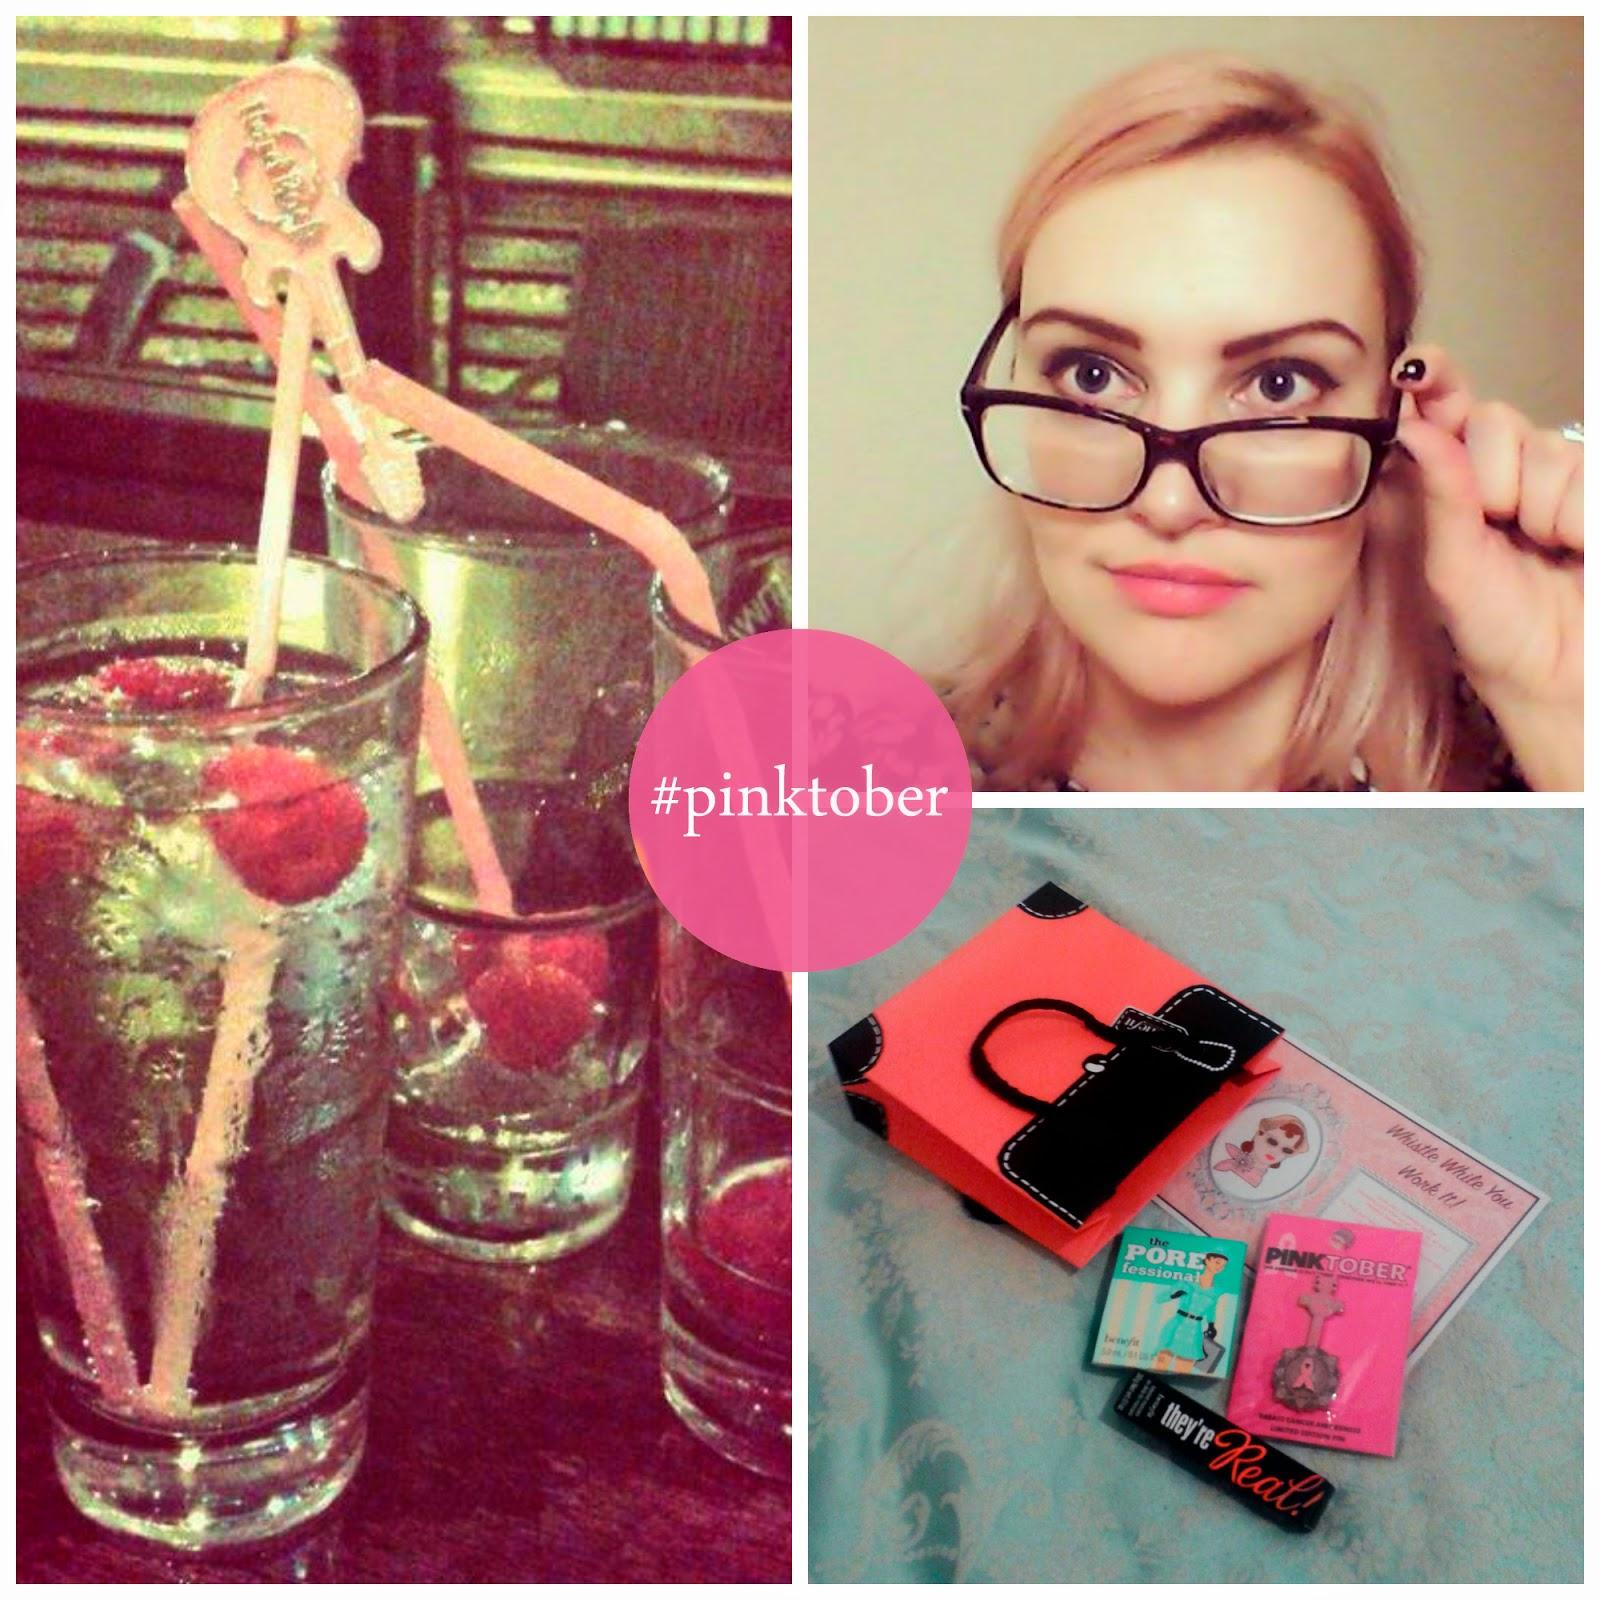 Hard Rock Cafe, Hard Rock Edinburgh, Blogger Event, Scottish Bloggers, Edinburgh bloggers, pinktober, #pinktober, cocktails, goody bags, benefit cosmetics, benefit make up, eyebrows